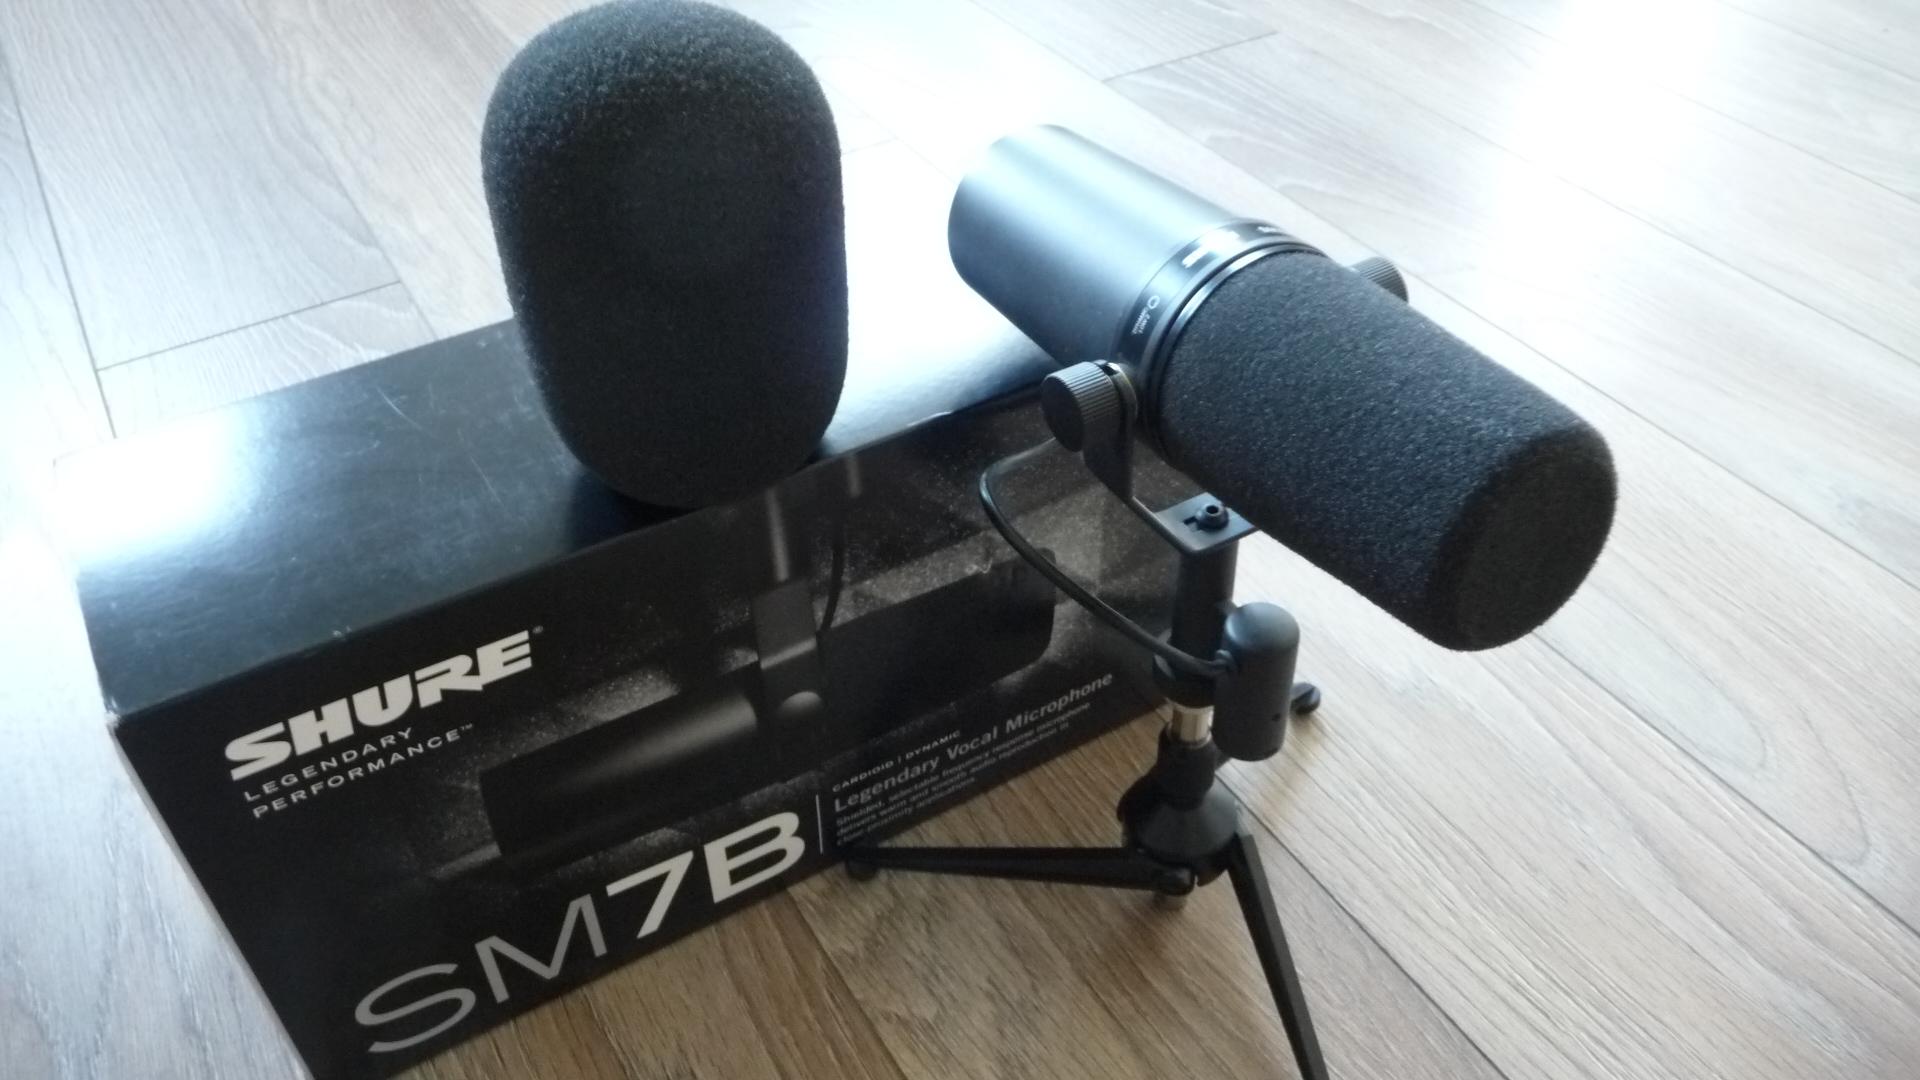 Shure Sm7b Review : shure sm7b image 415714 audiofanzine ~ Russianpoet.info Haus und Dekorationen